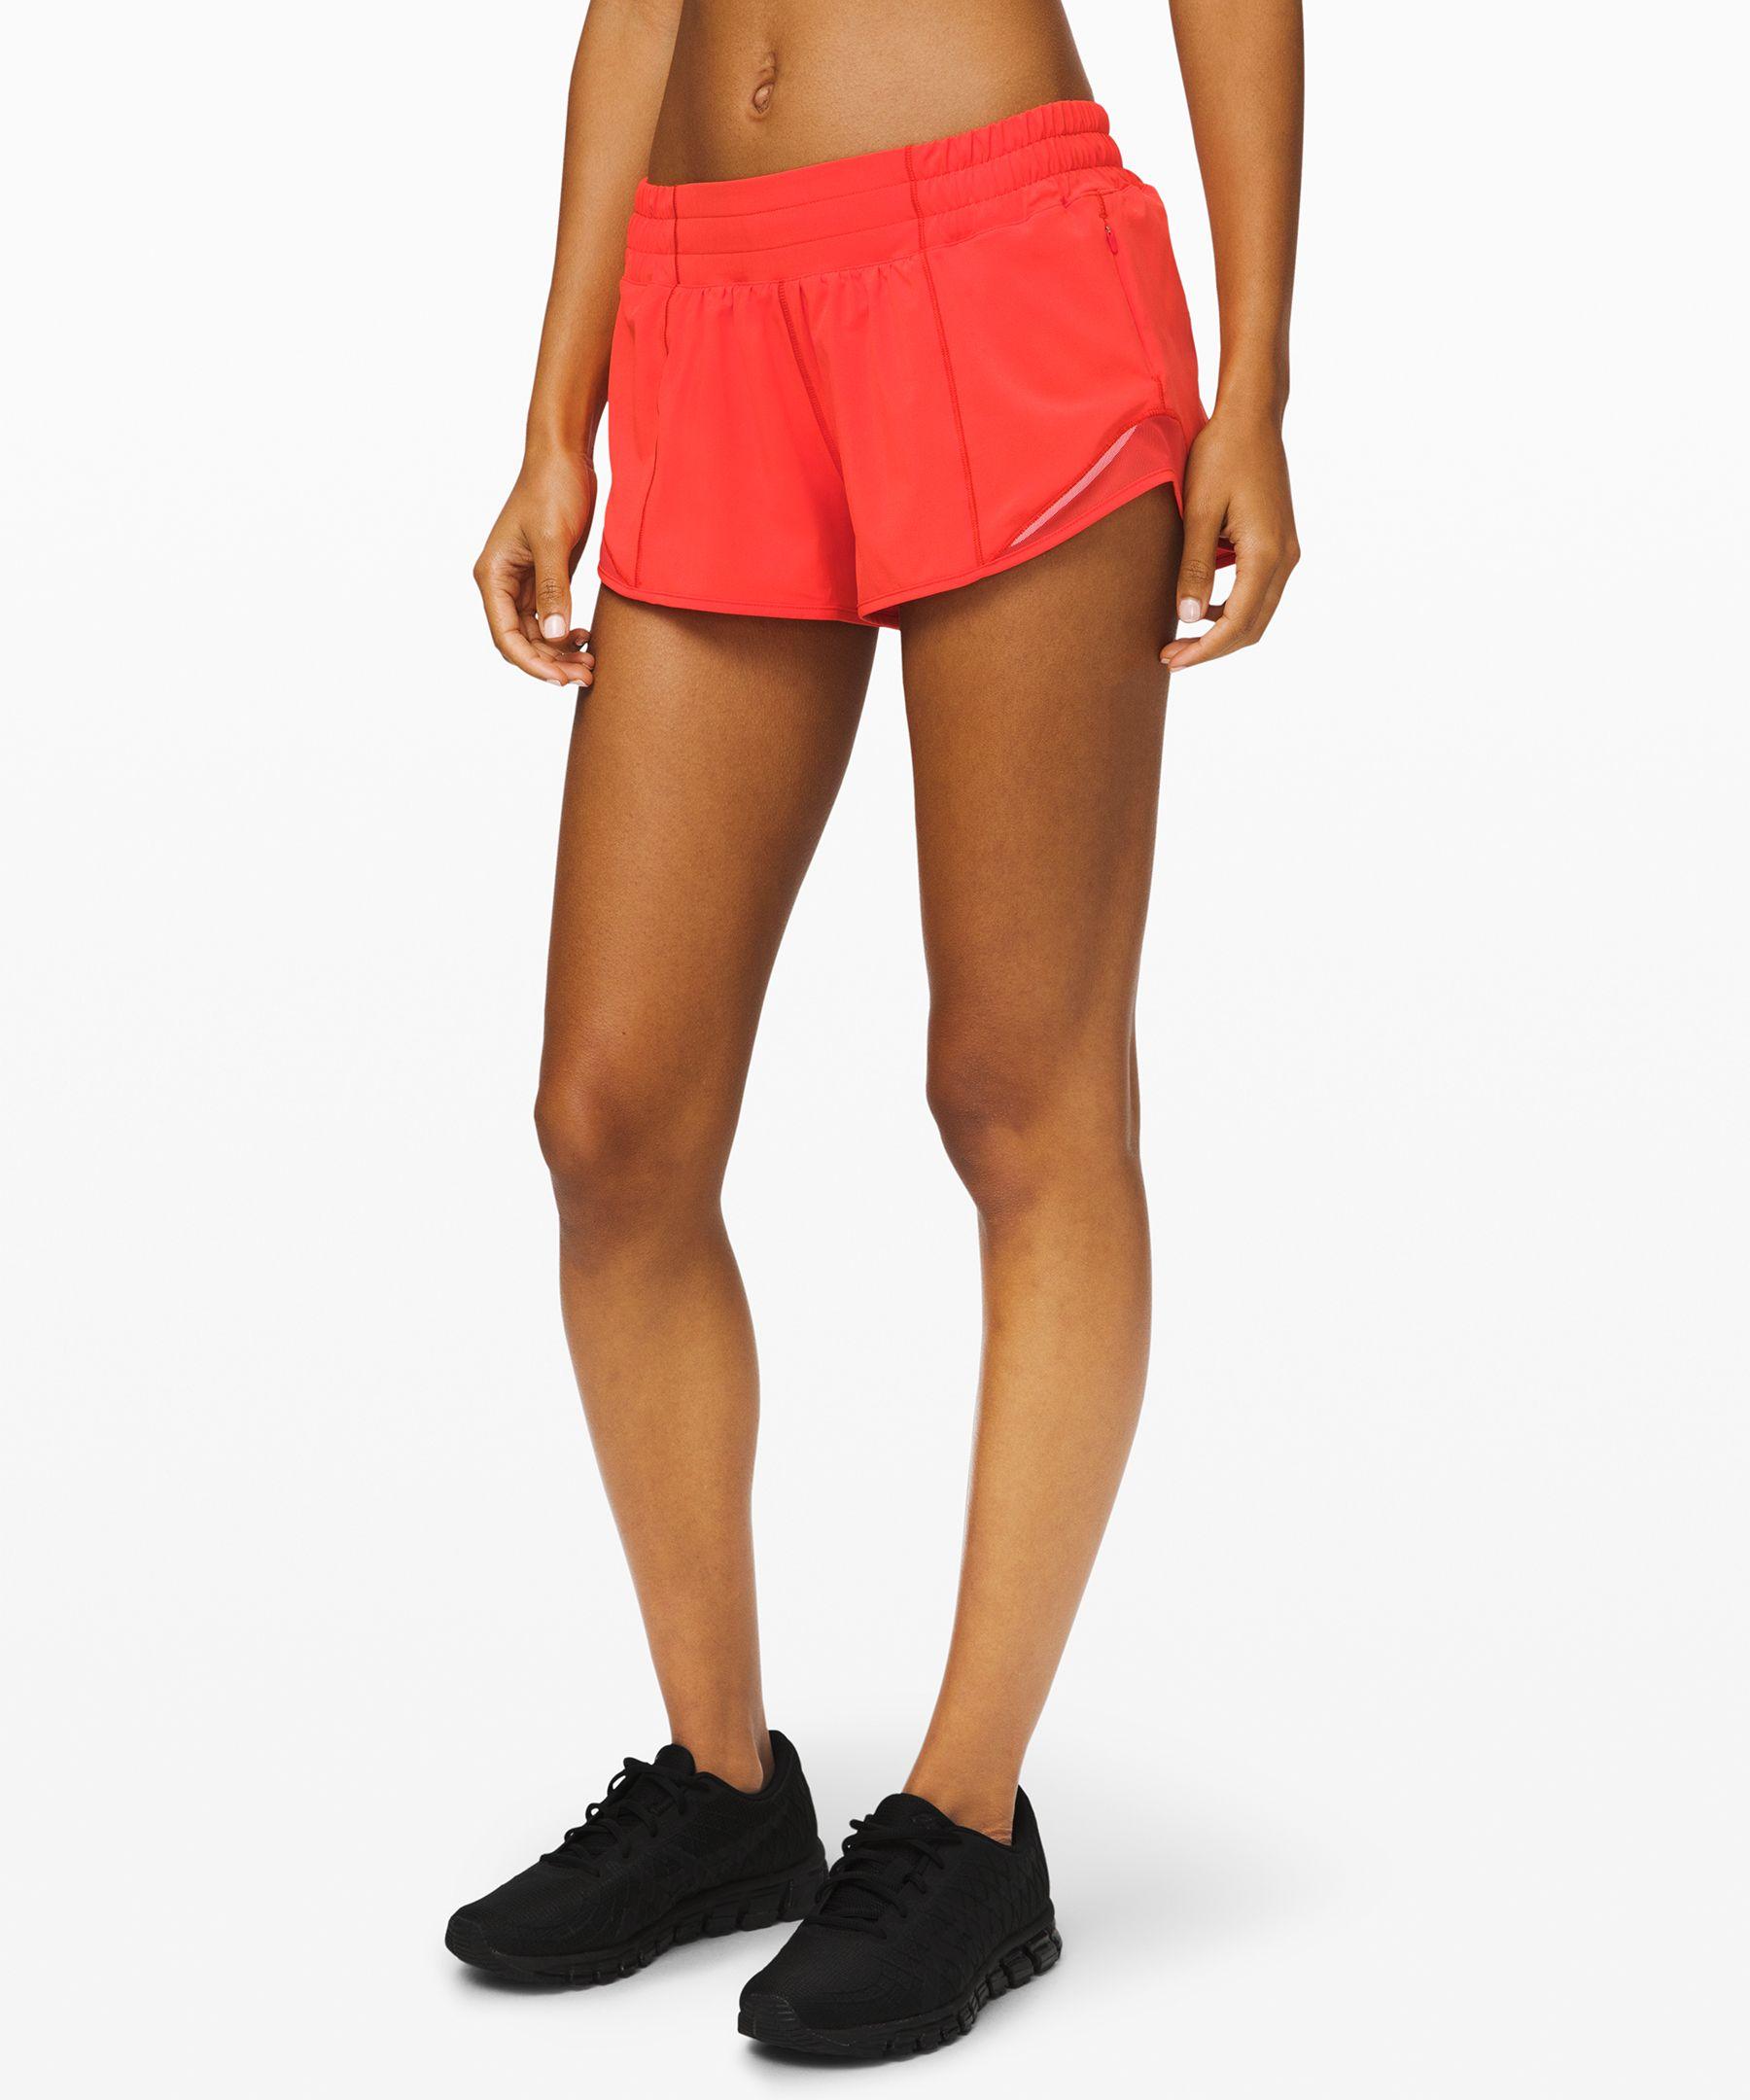 Hotty Hot Short Ii 2 5 Women S Shorts Lululemon